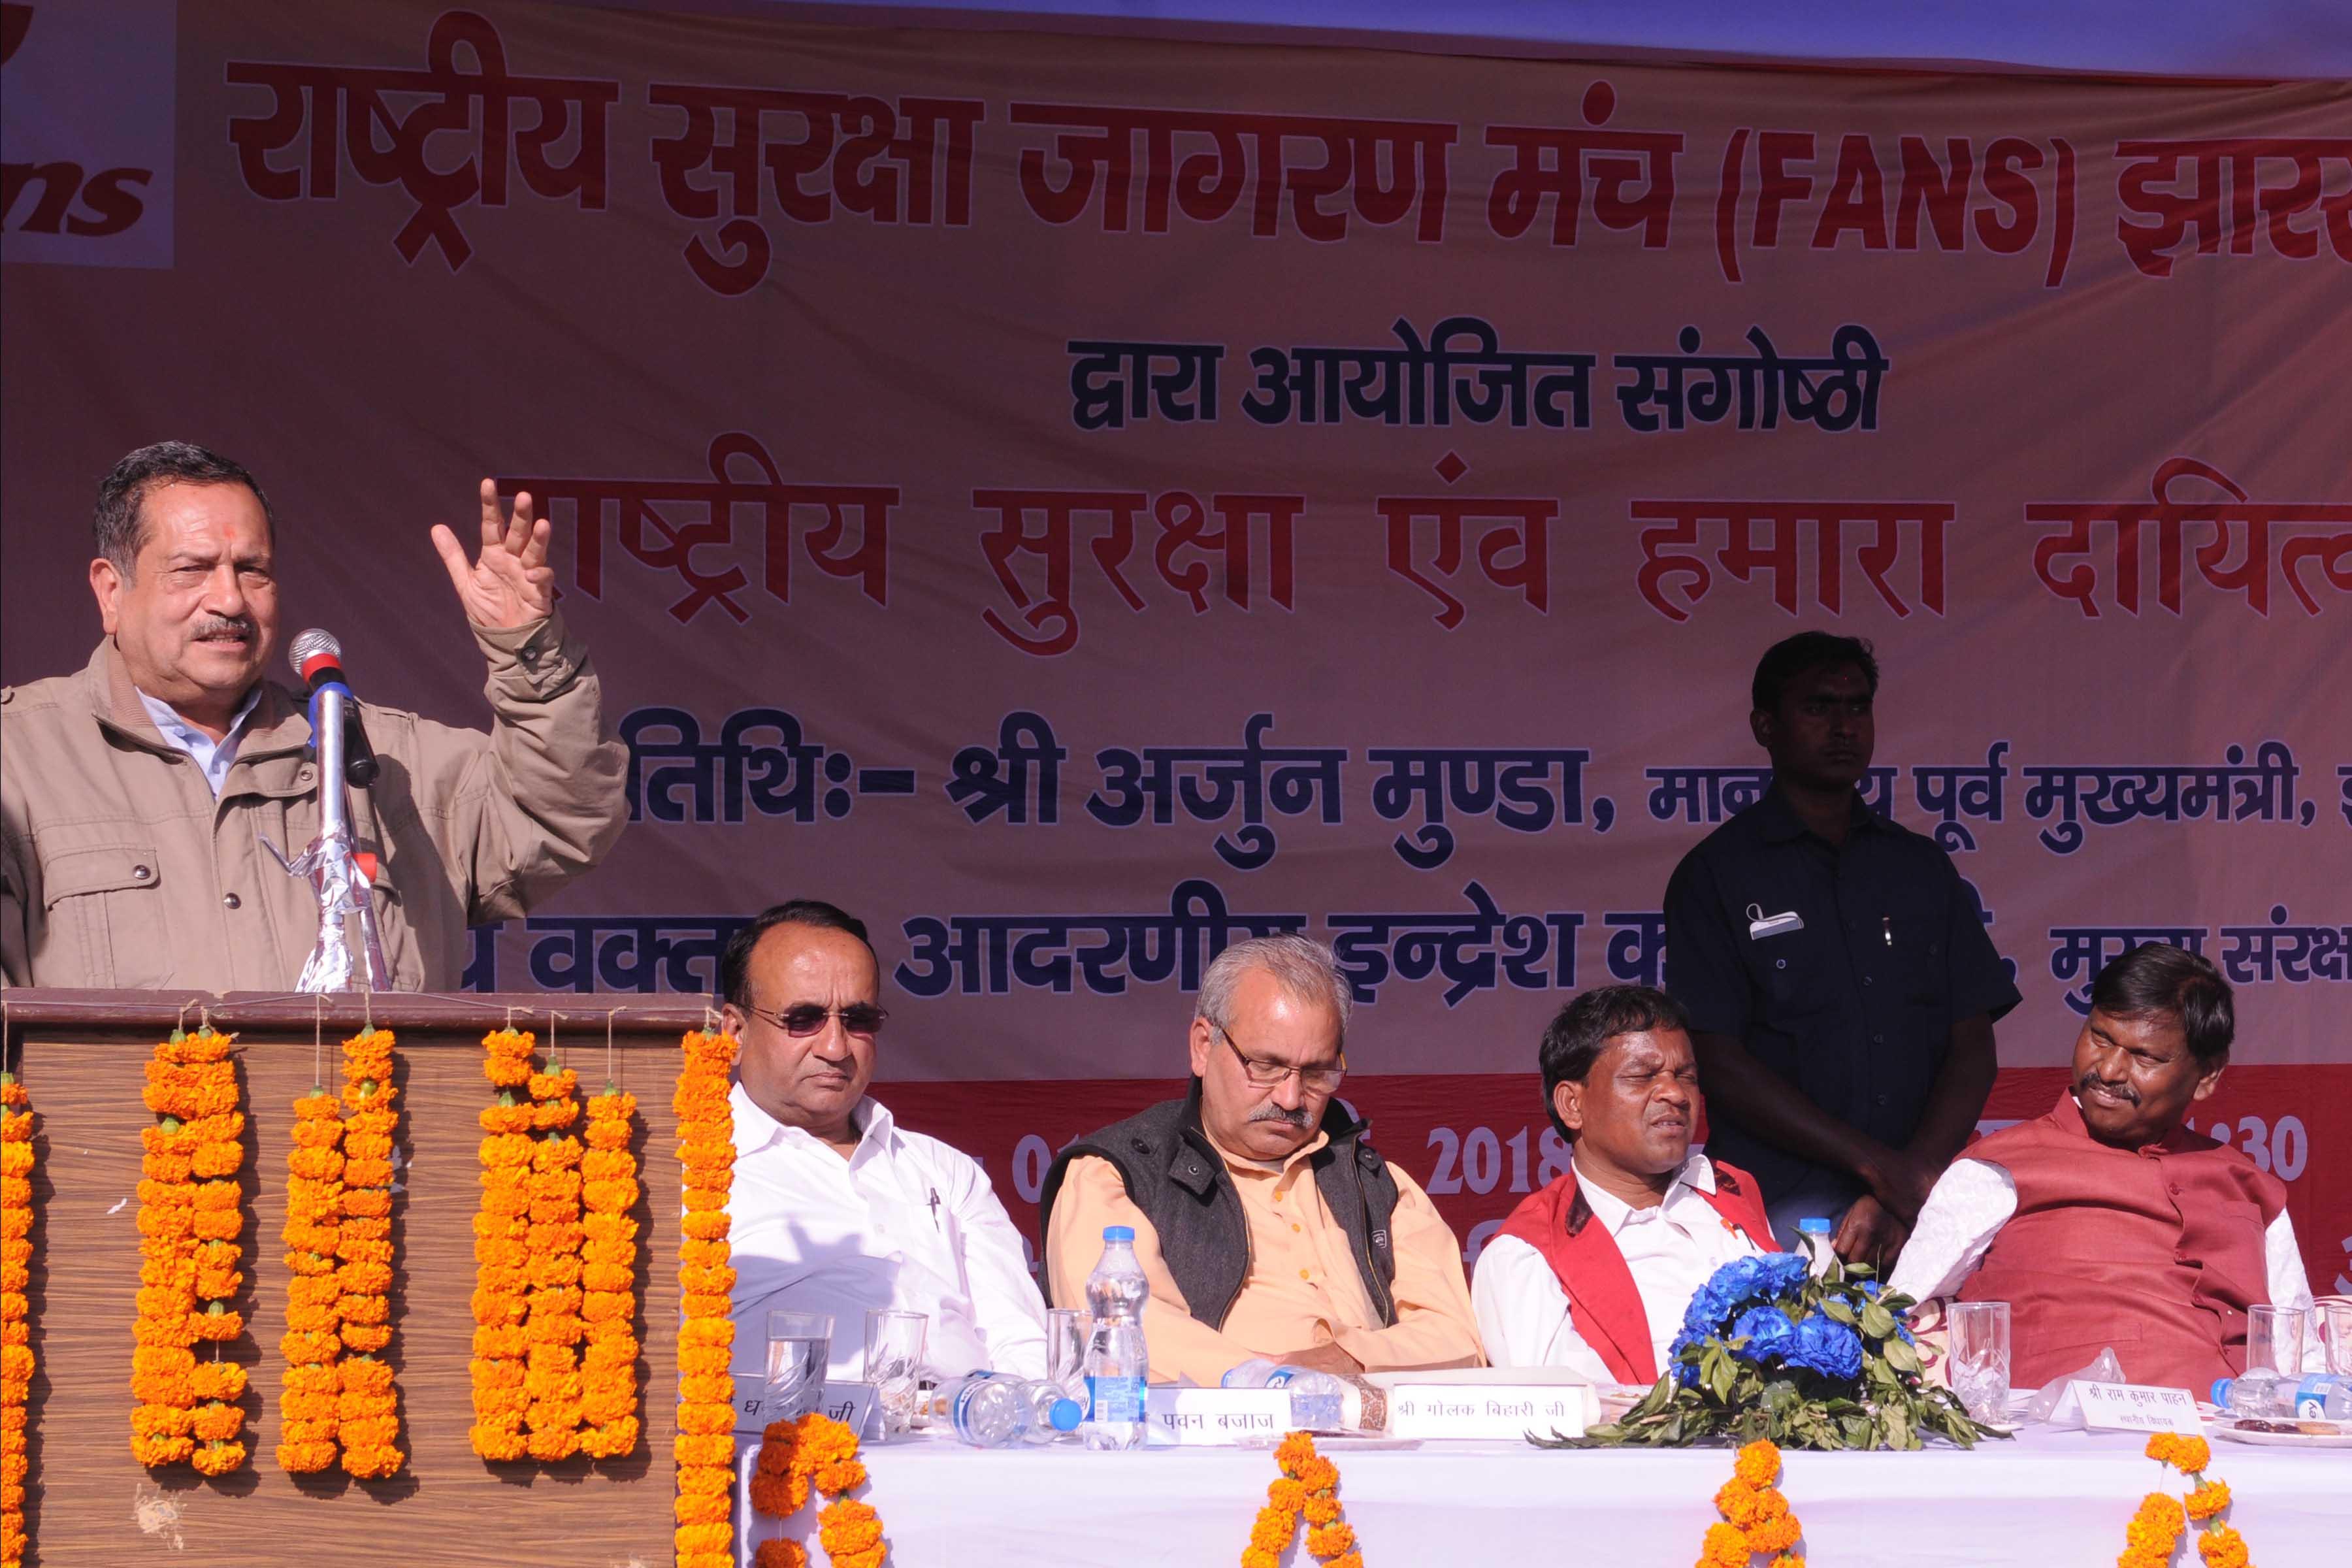 <p>Chief Patron of FANS and RSS executive committee member Indresh Kumar, Former Jharkhand Chief Minister Arjun Munda, Ranchi University Vice ChancellorRamesh Kumar Pandey,…